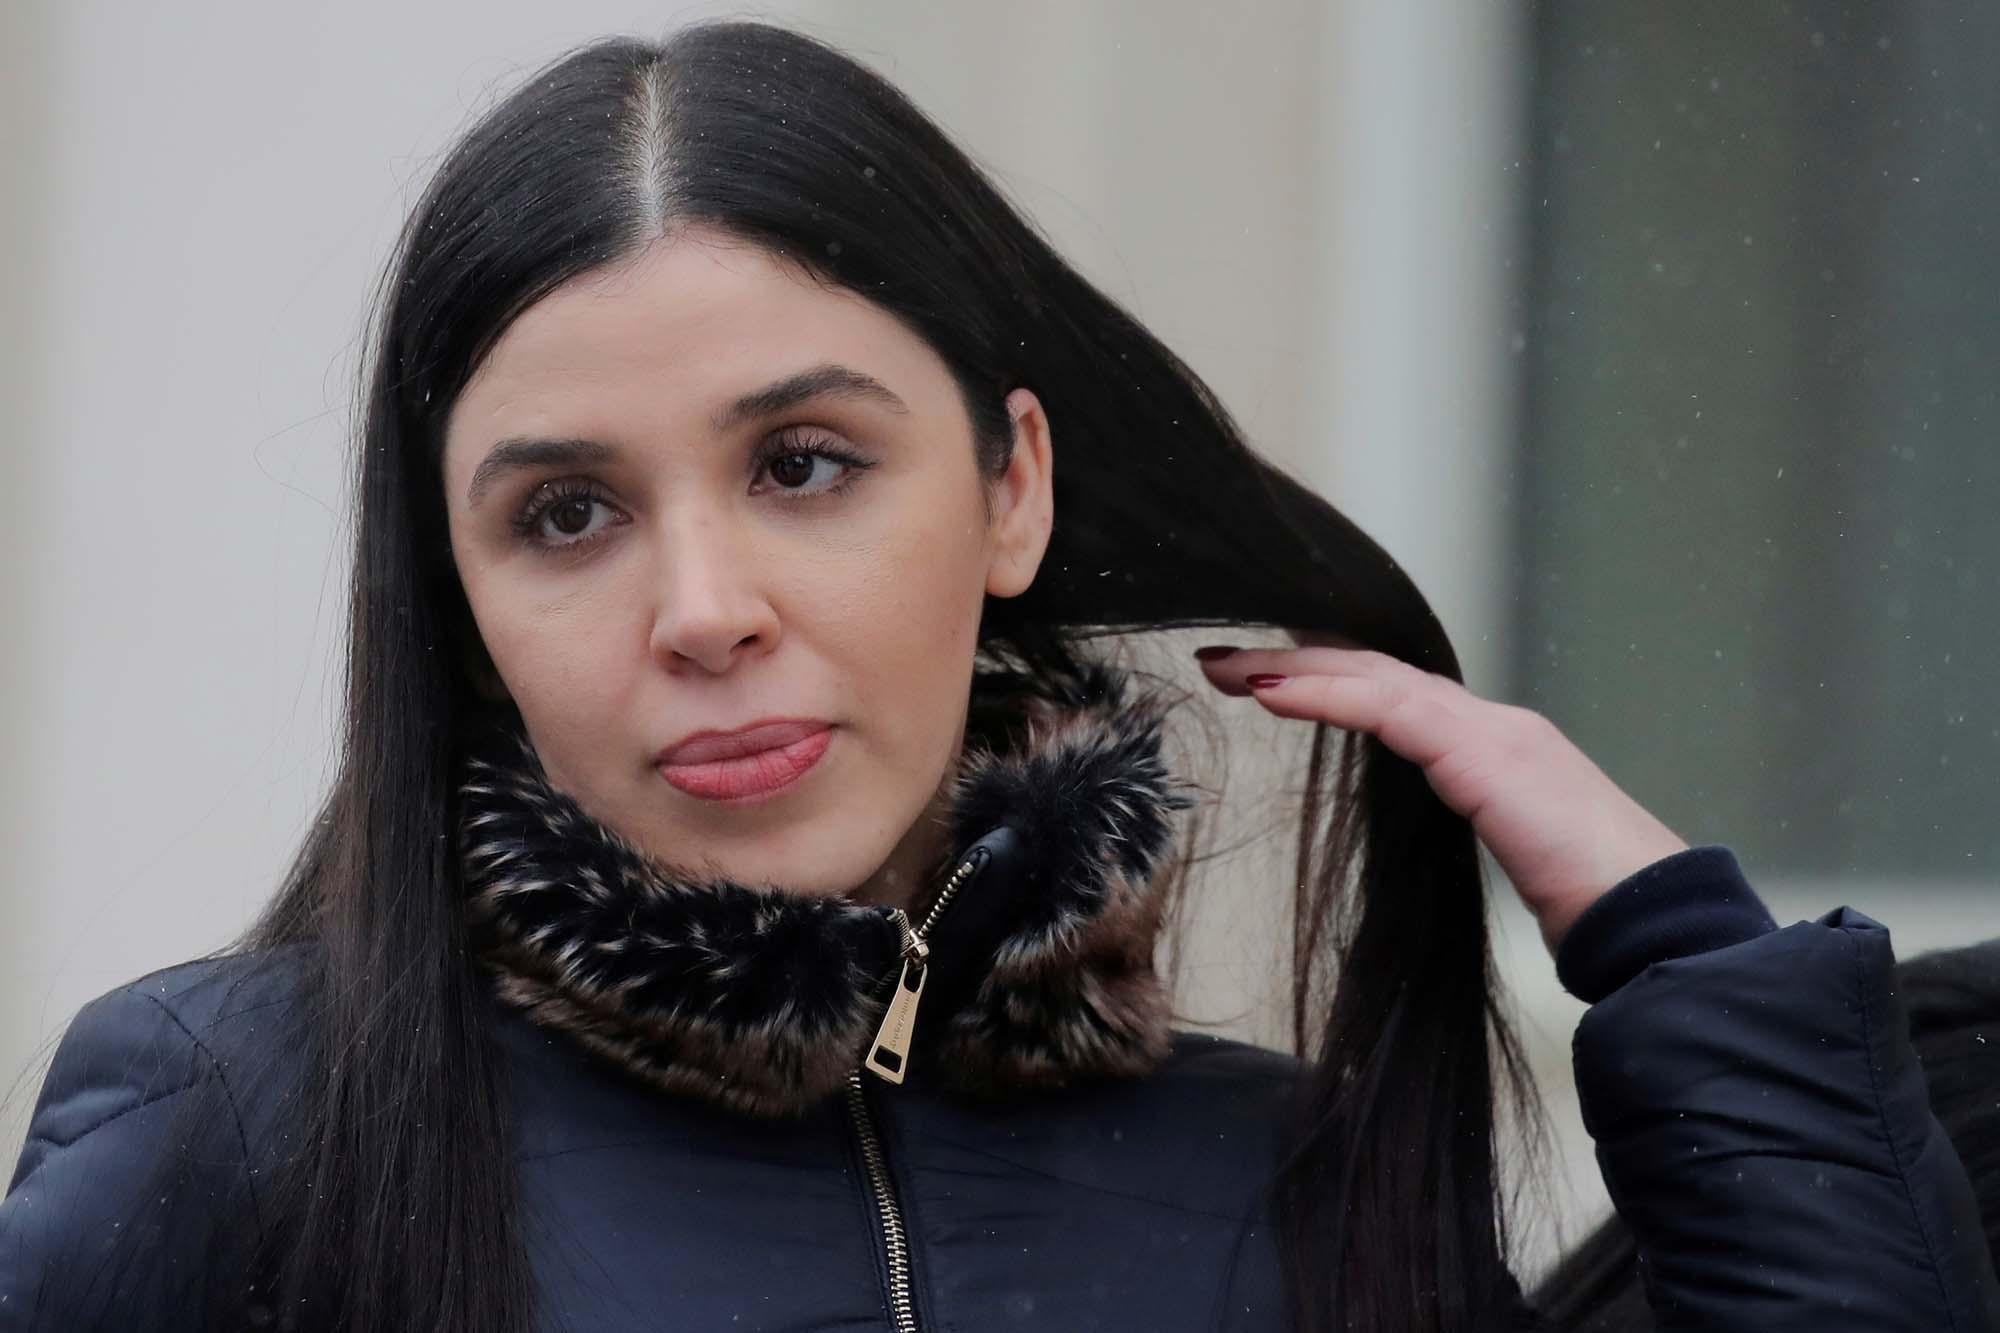 El Chapo's wife Emma Coronel Aispuro in talks to join VH1's 'Cartel Crew'